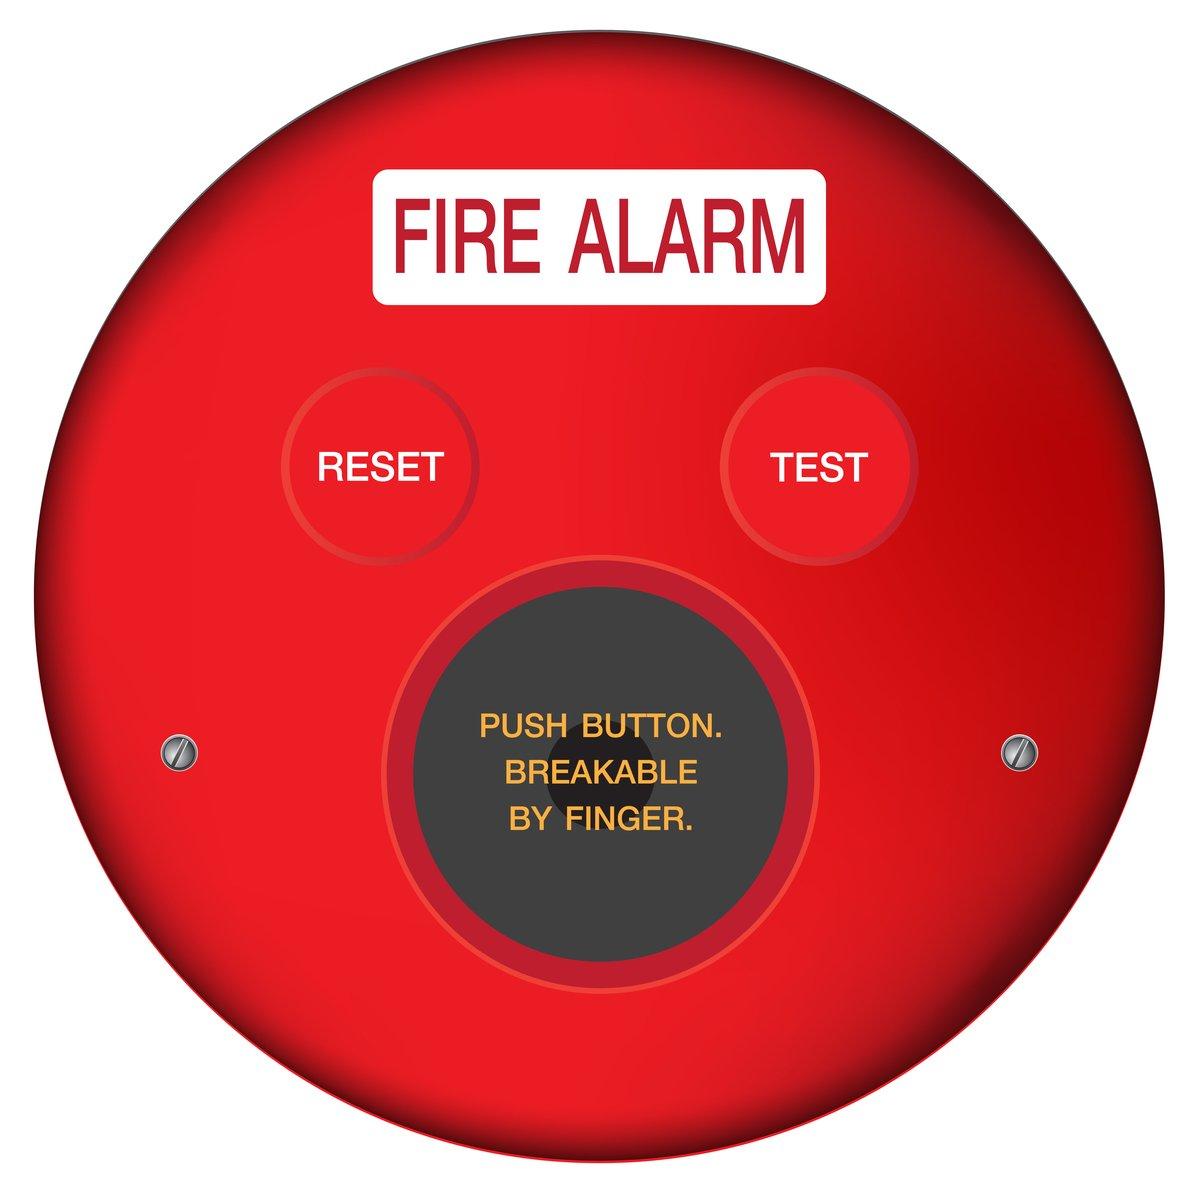 test fire alarm